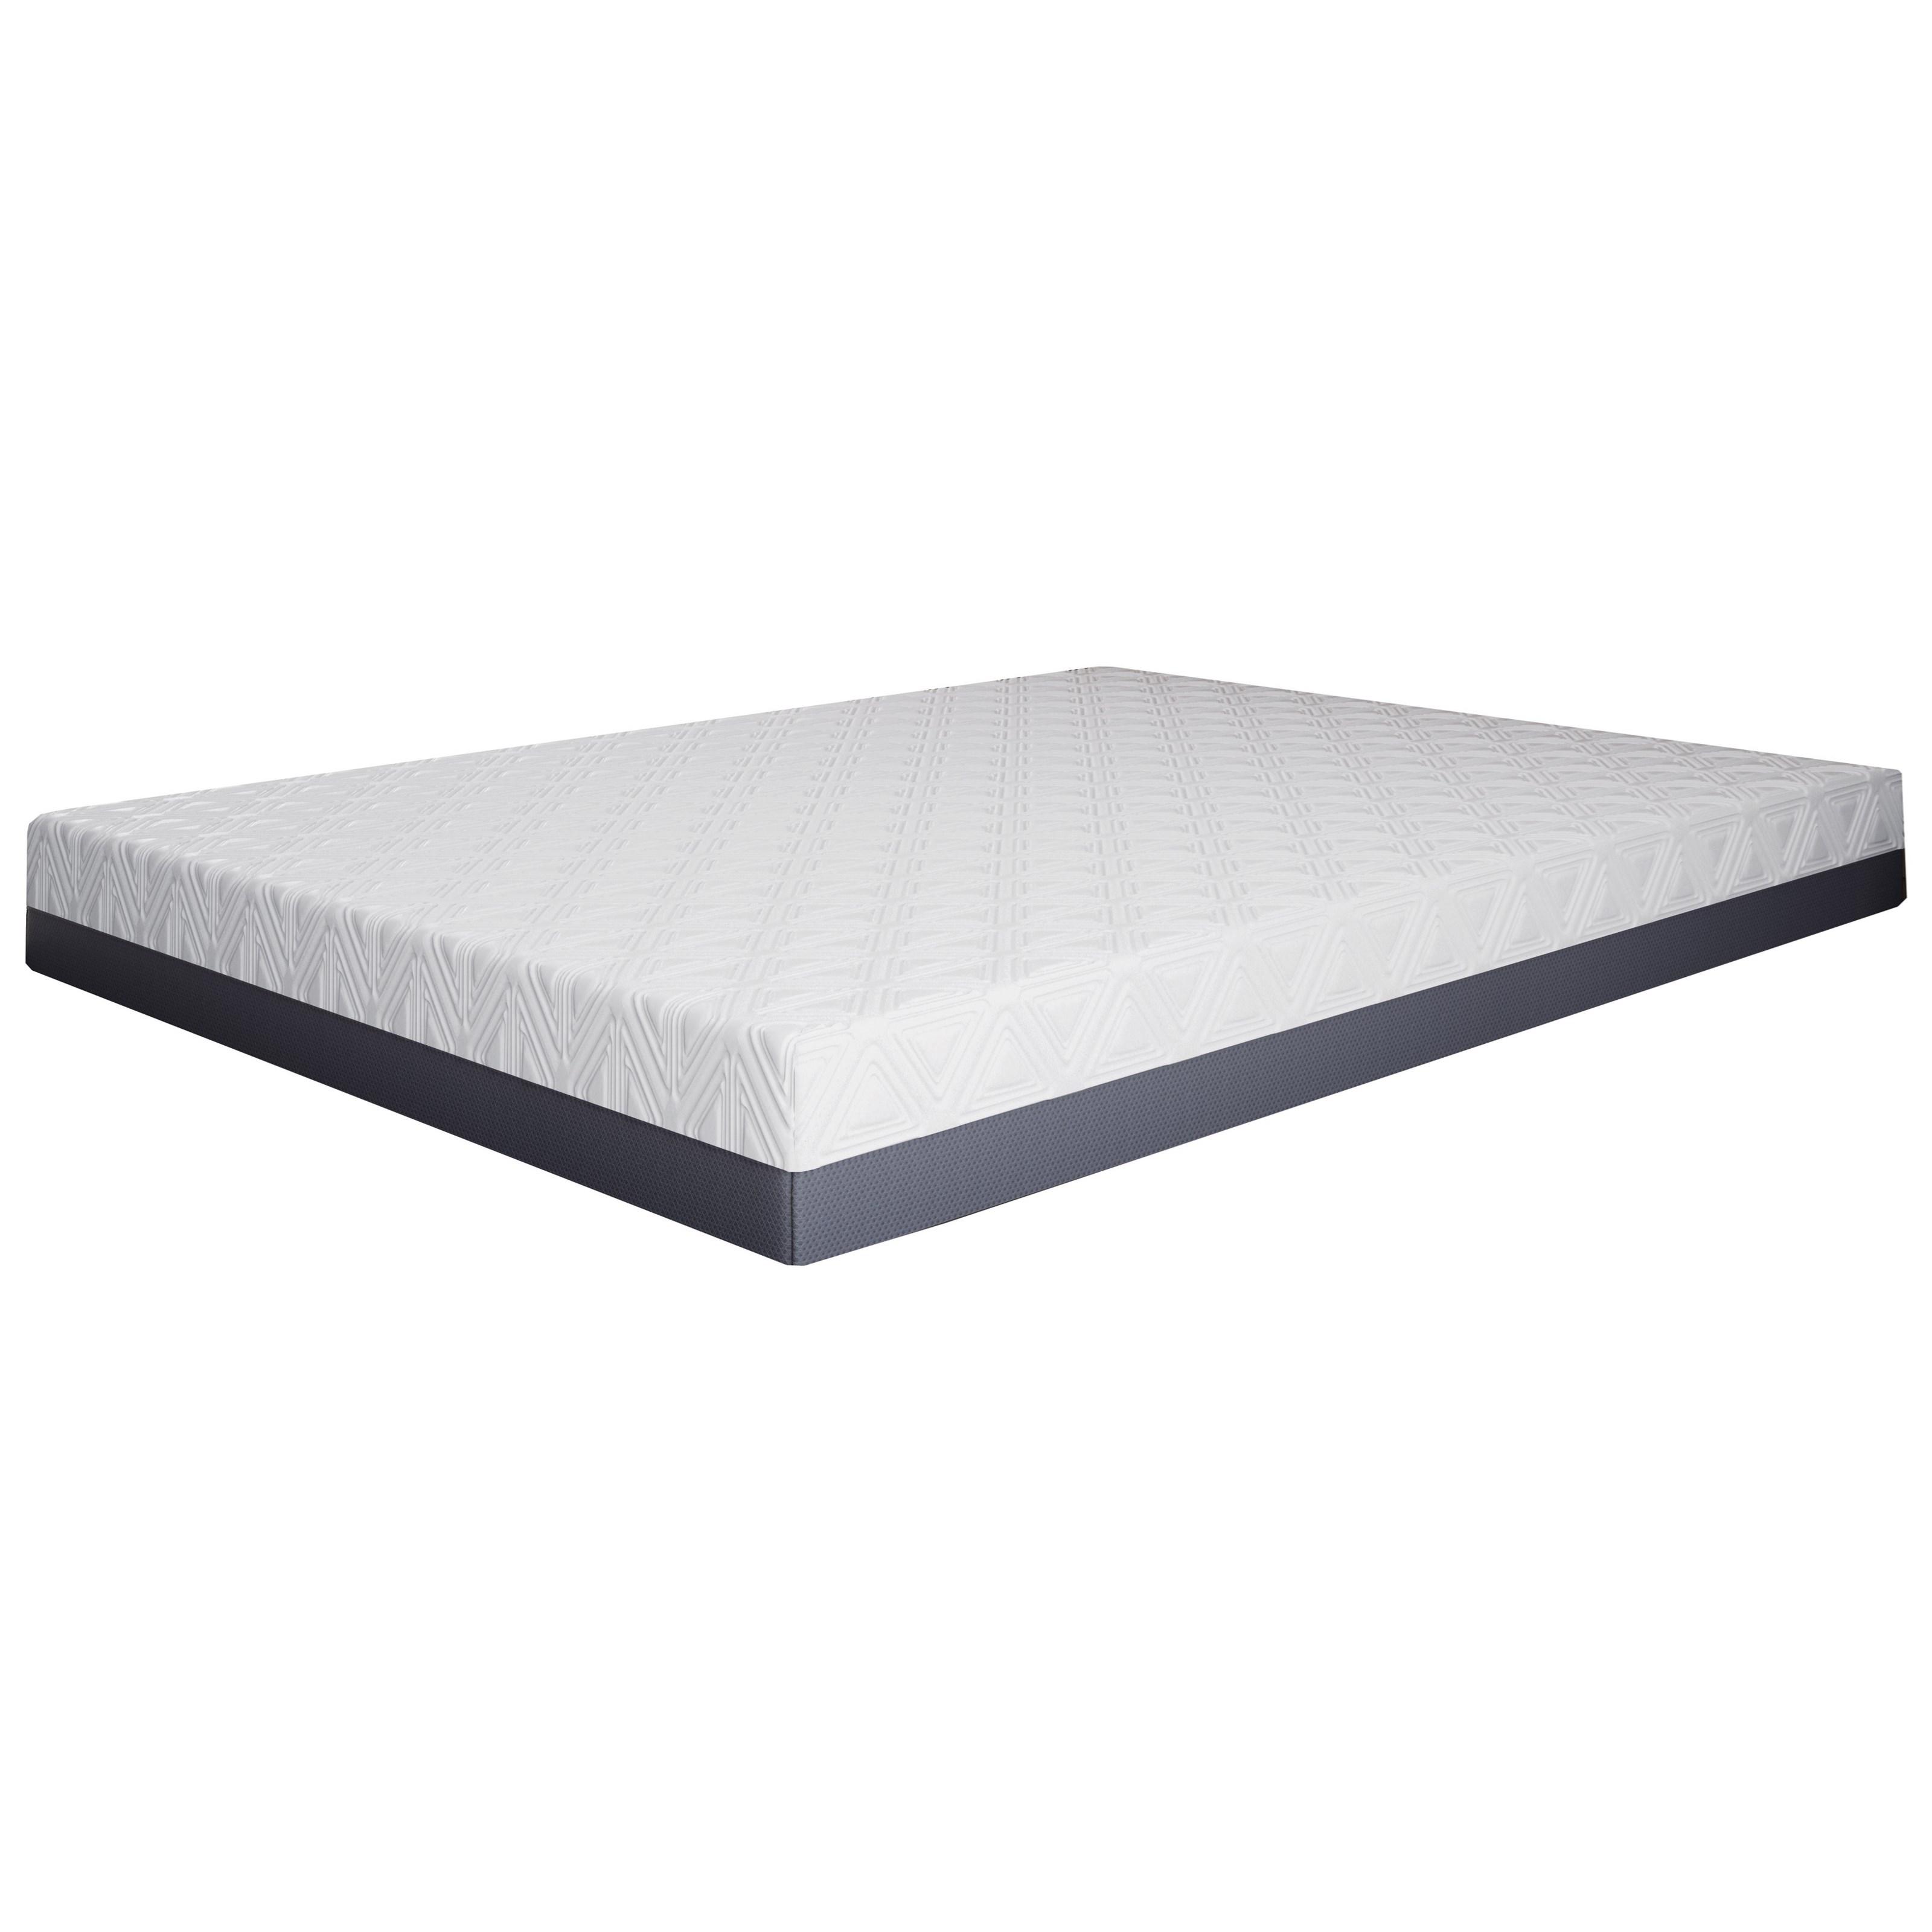 Bedtech Pur Gel Colorado 10 Pg1046 Full Gel Memory Foam Mattress